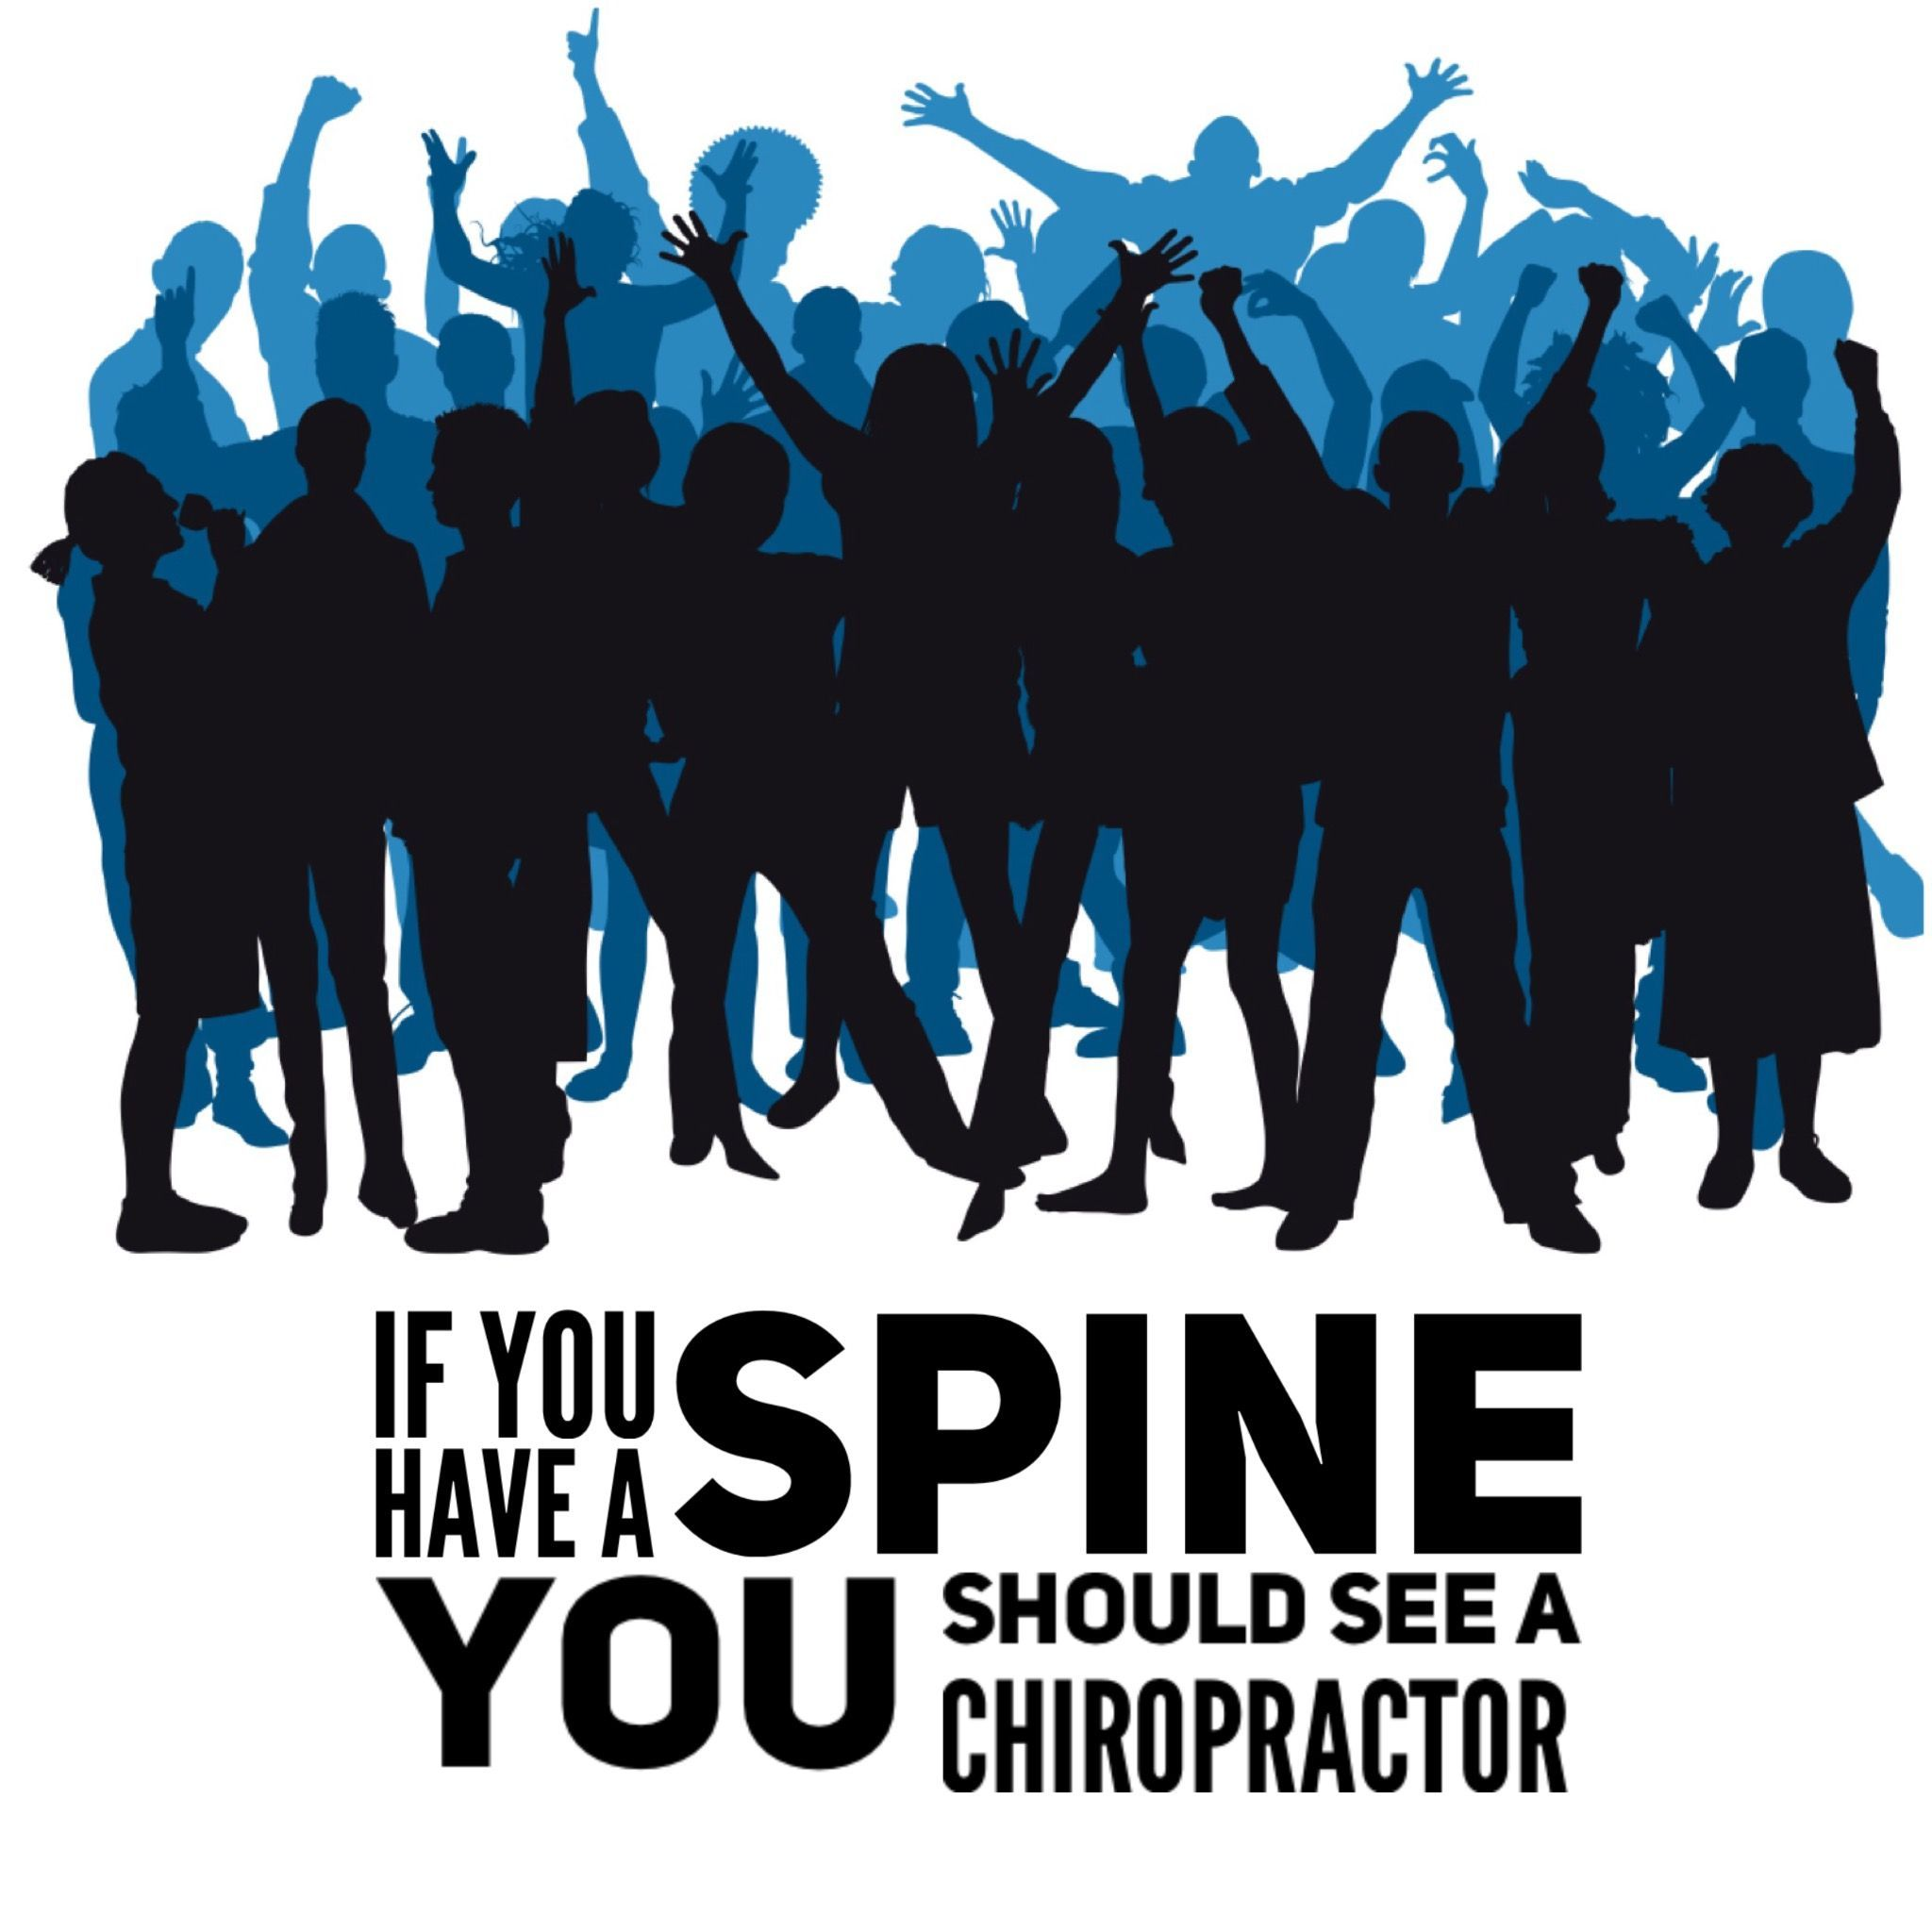 Chiropractic chiropractic chiropractic care